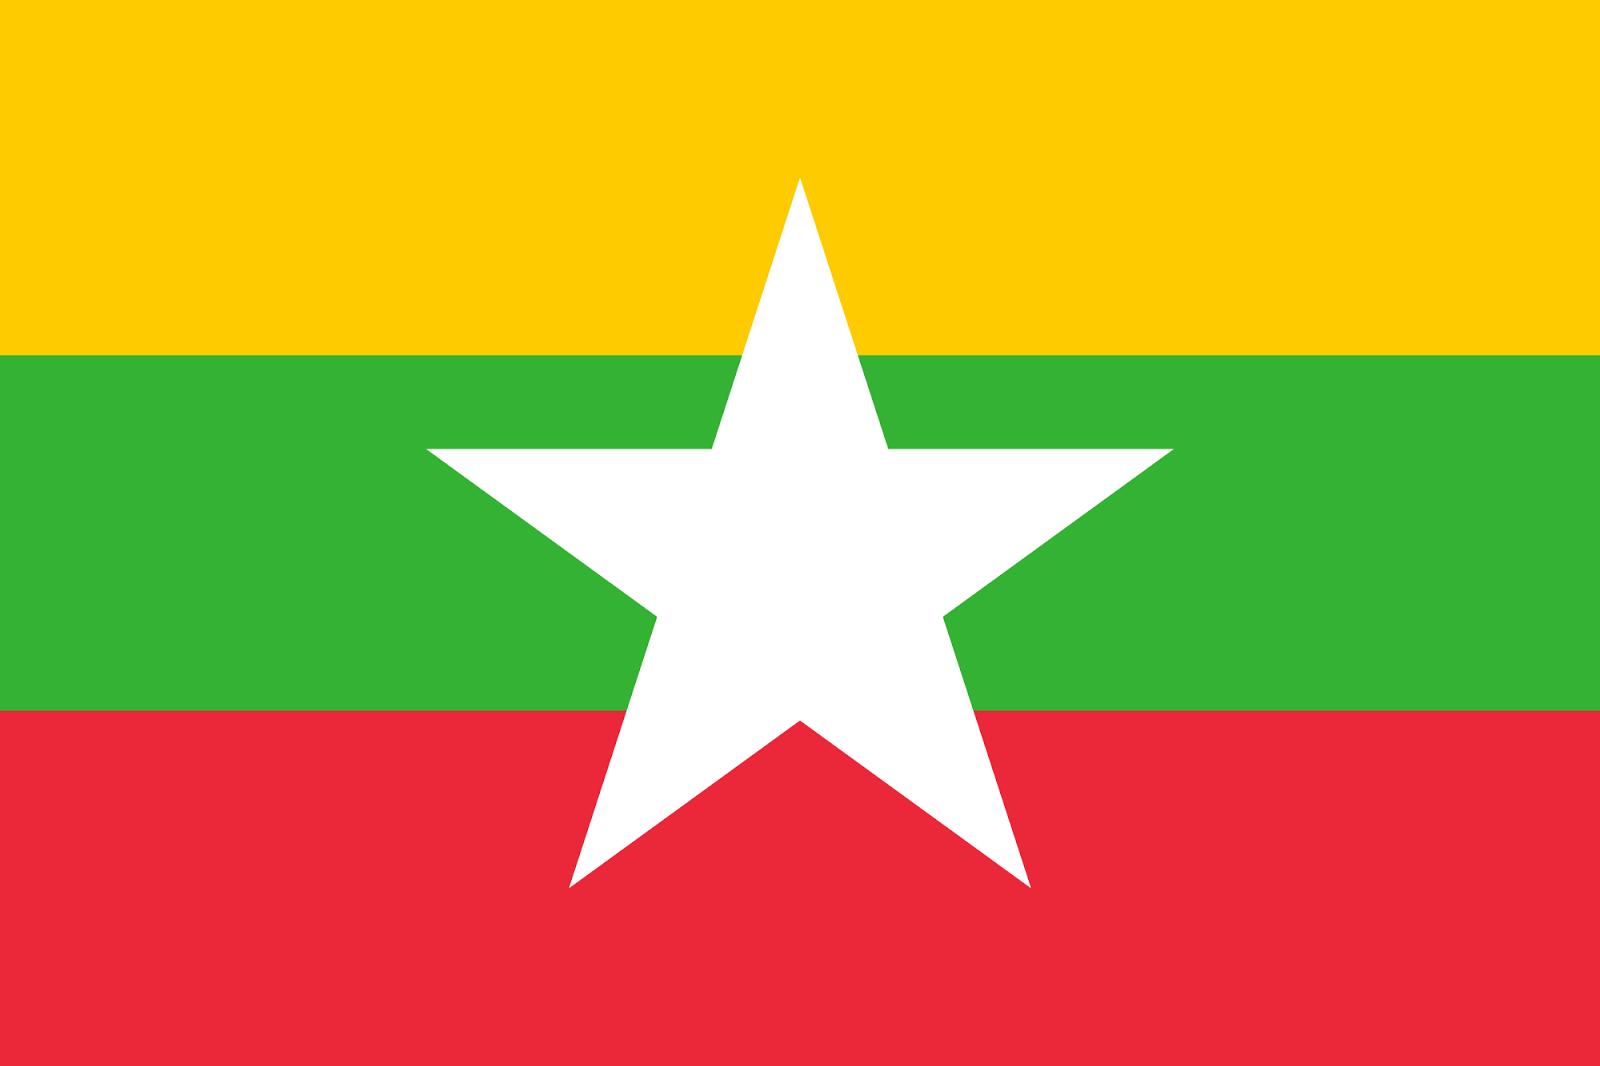 http://carbrandsincurrentproduction.blogspot.com.es/search/label/Myanmar